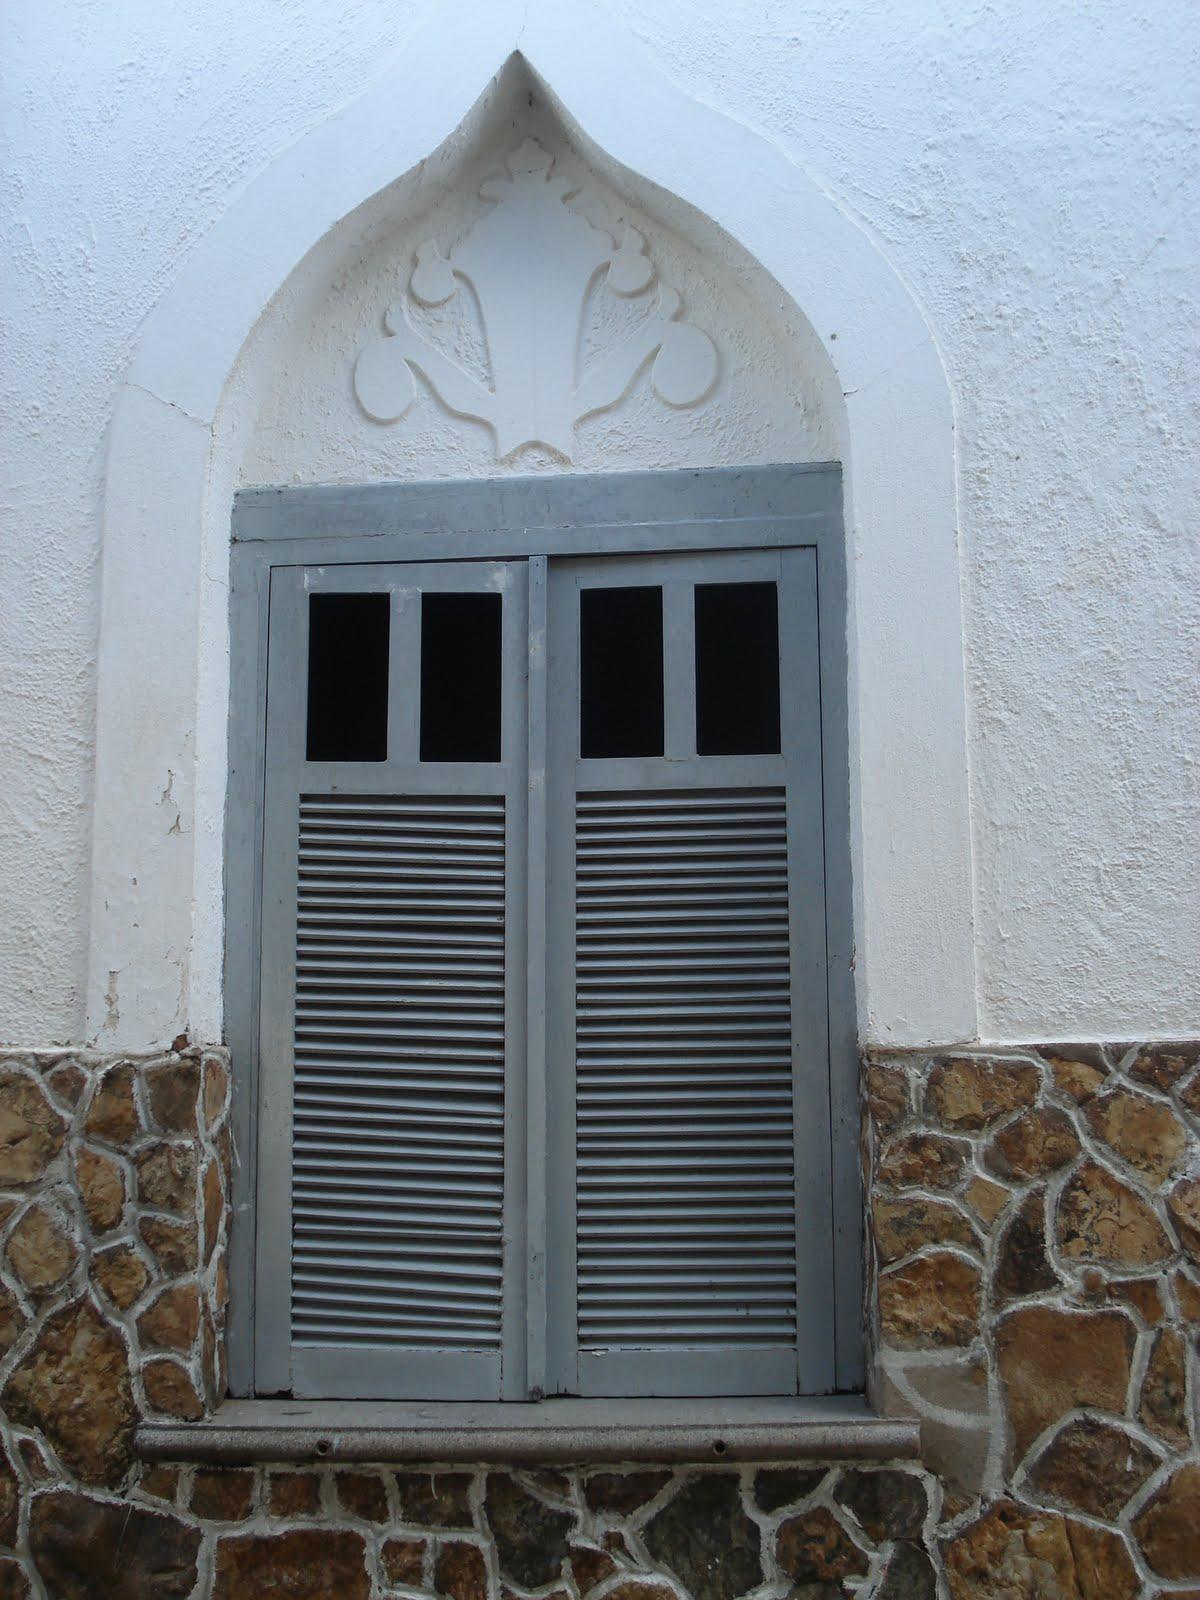 #476684 KAKI AFONSO Arquitetura: Janelas da arquitetura piauiense: Amarante. 474 Janelas Duplas Madeira